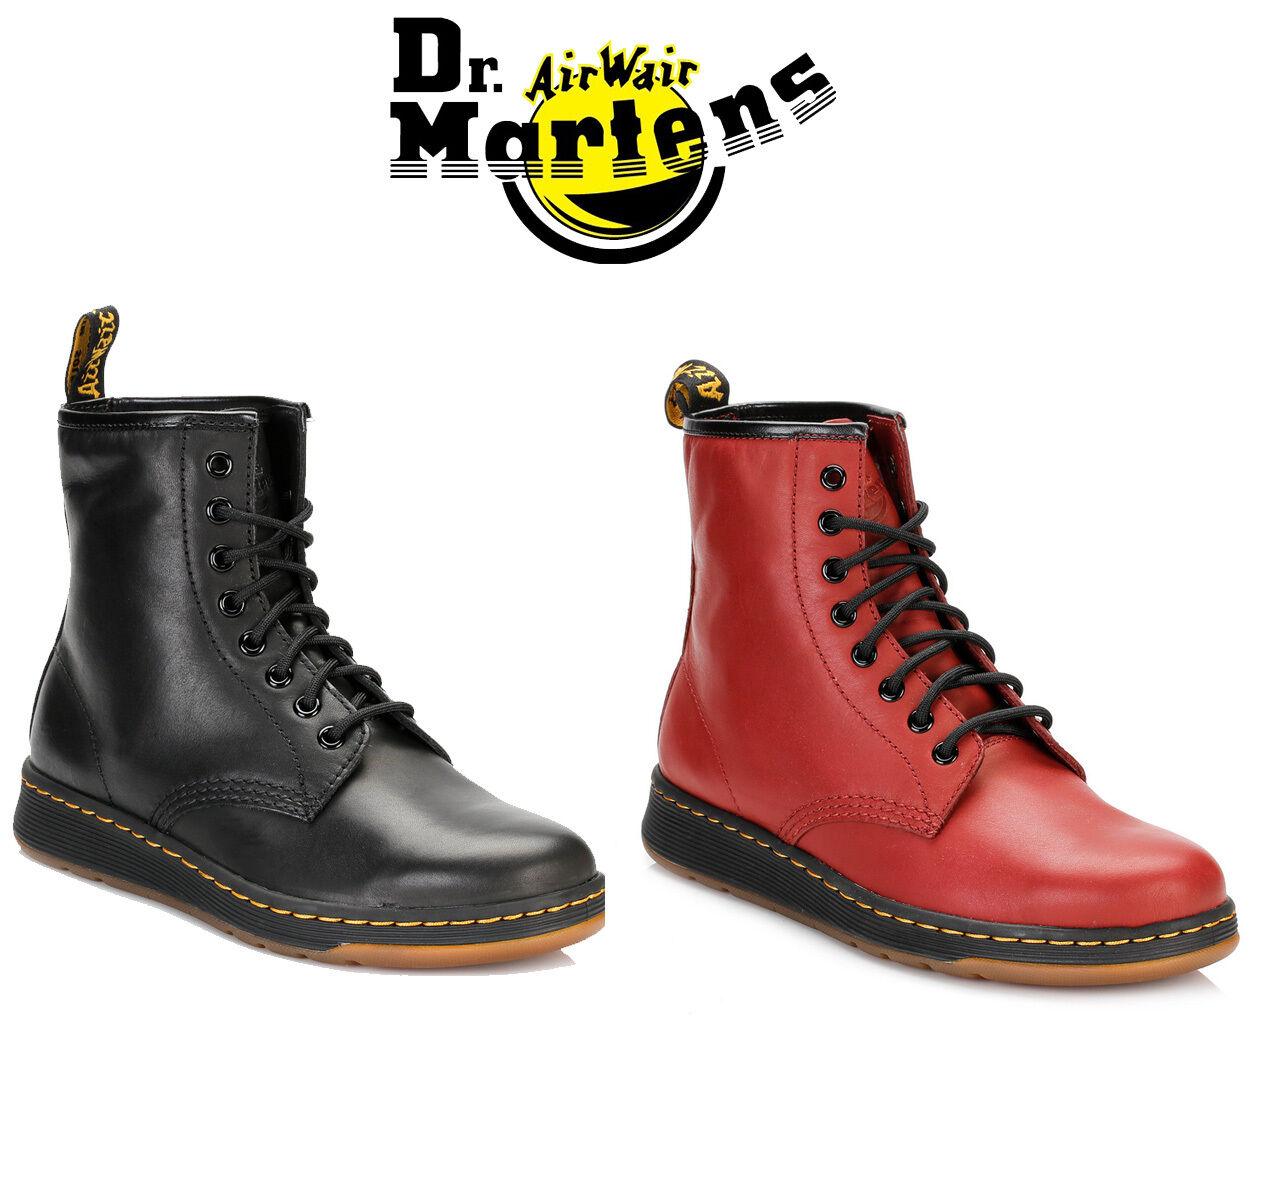 Dr Martens Unisex 1460 schwarz or ROT Ankle Stiefel, Mens Damenschuhe Leder Schuhes